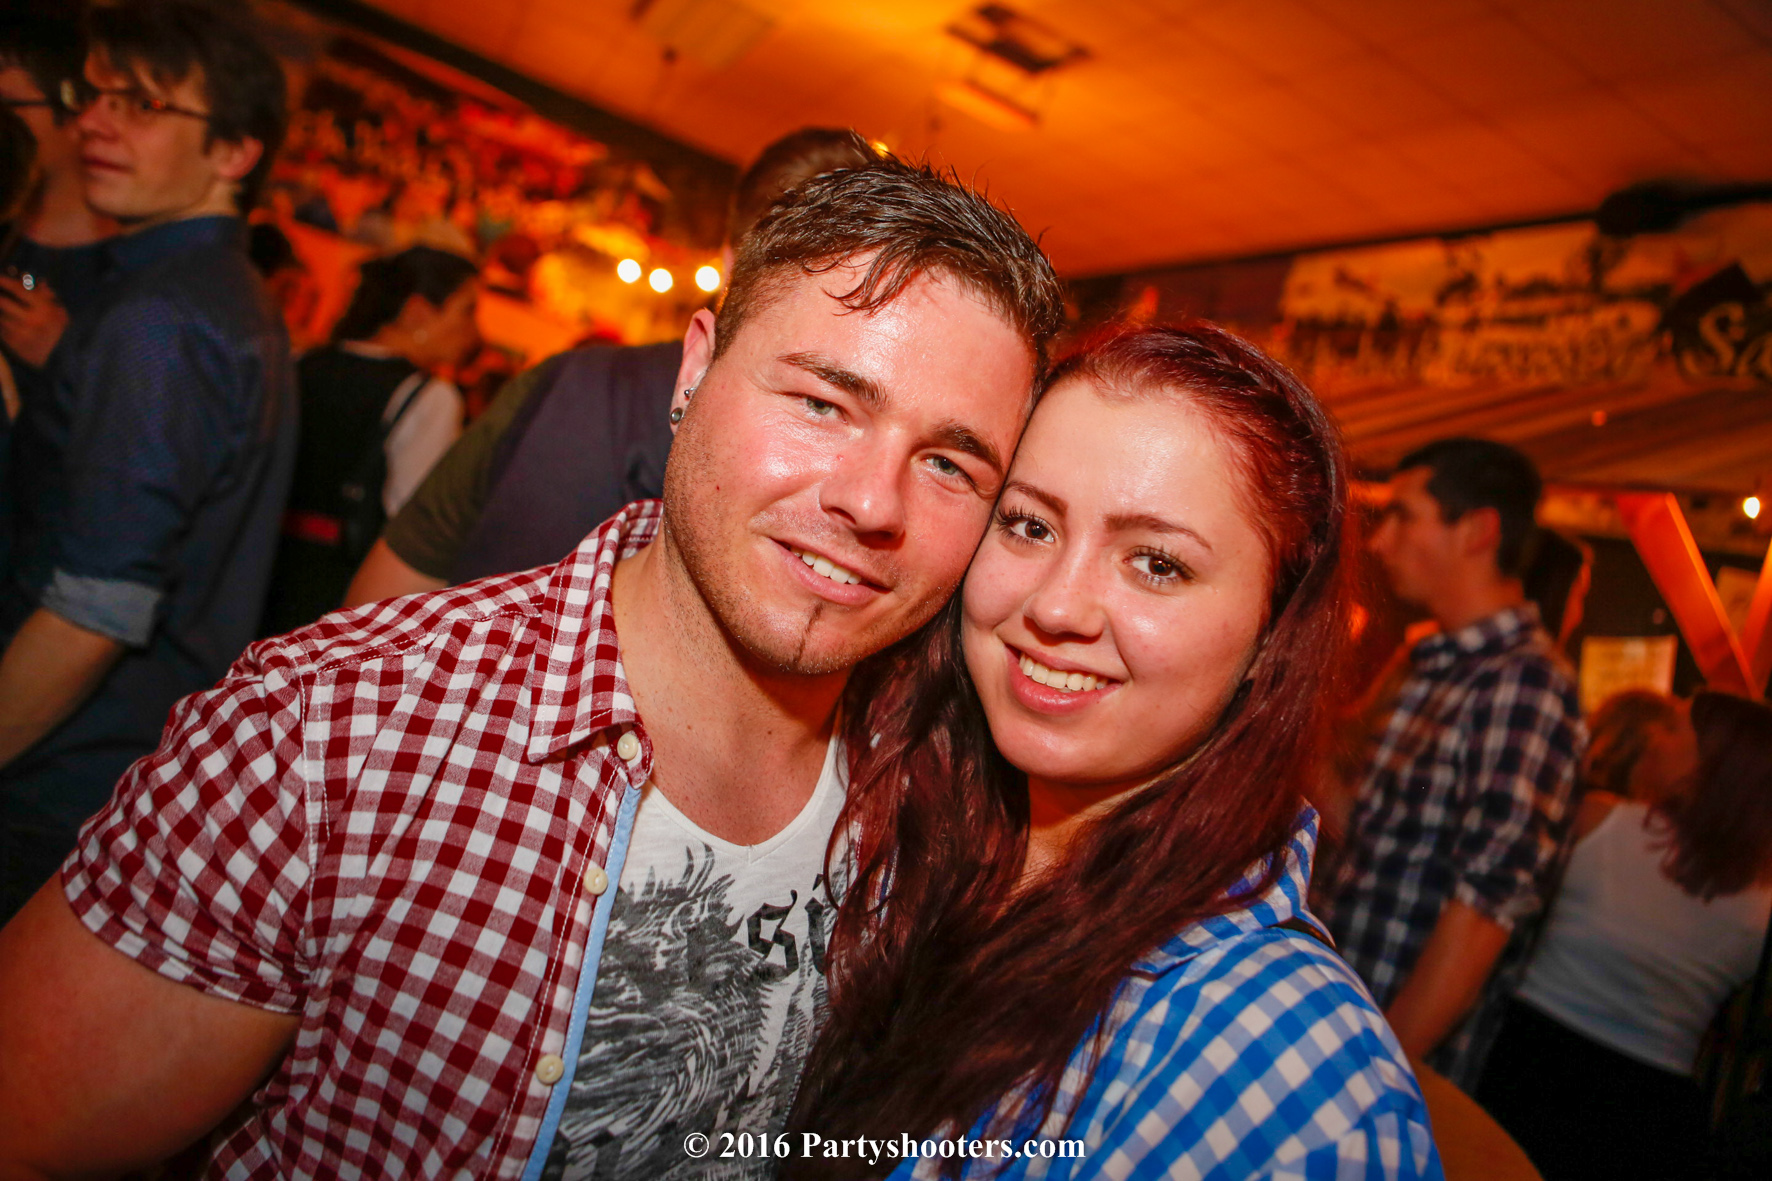 0103 - 4123 - Fruehlingsball Aspach